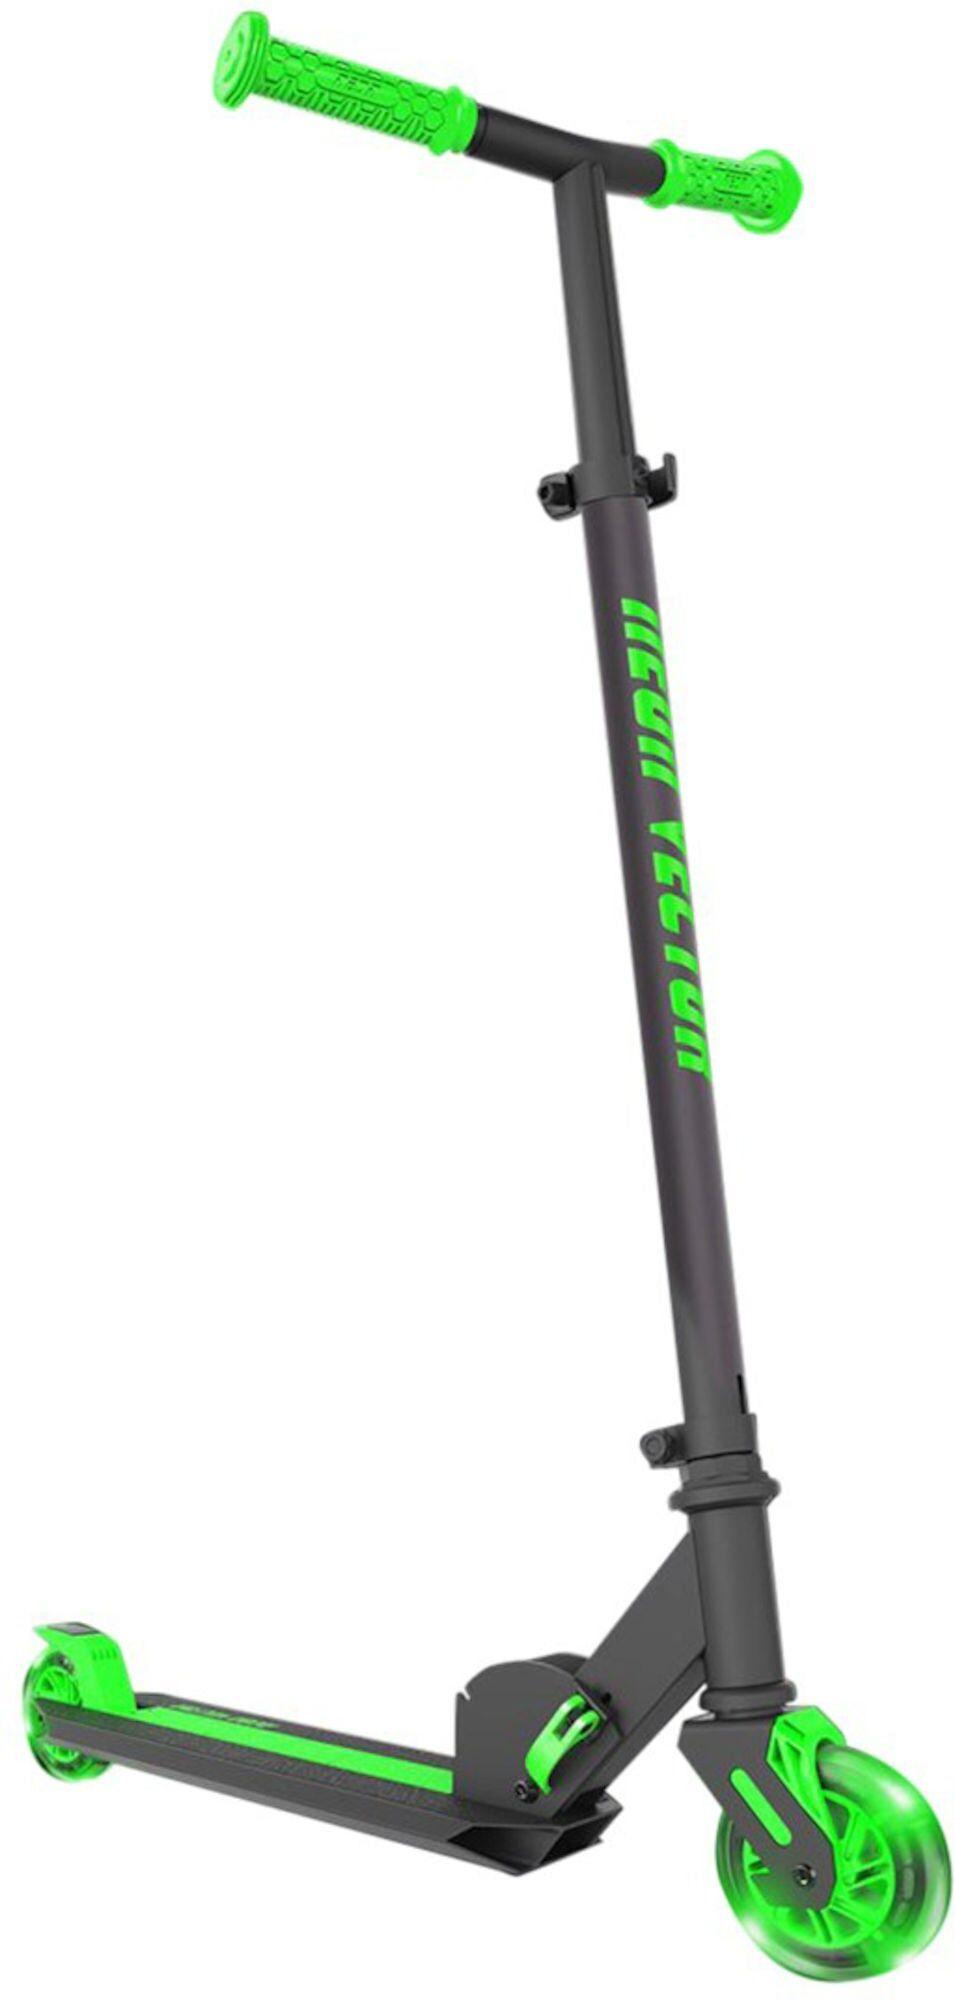 NEON Sparkcykel Vector, Grön